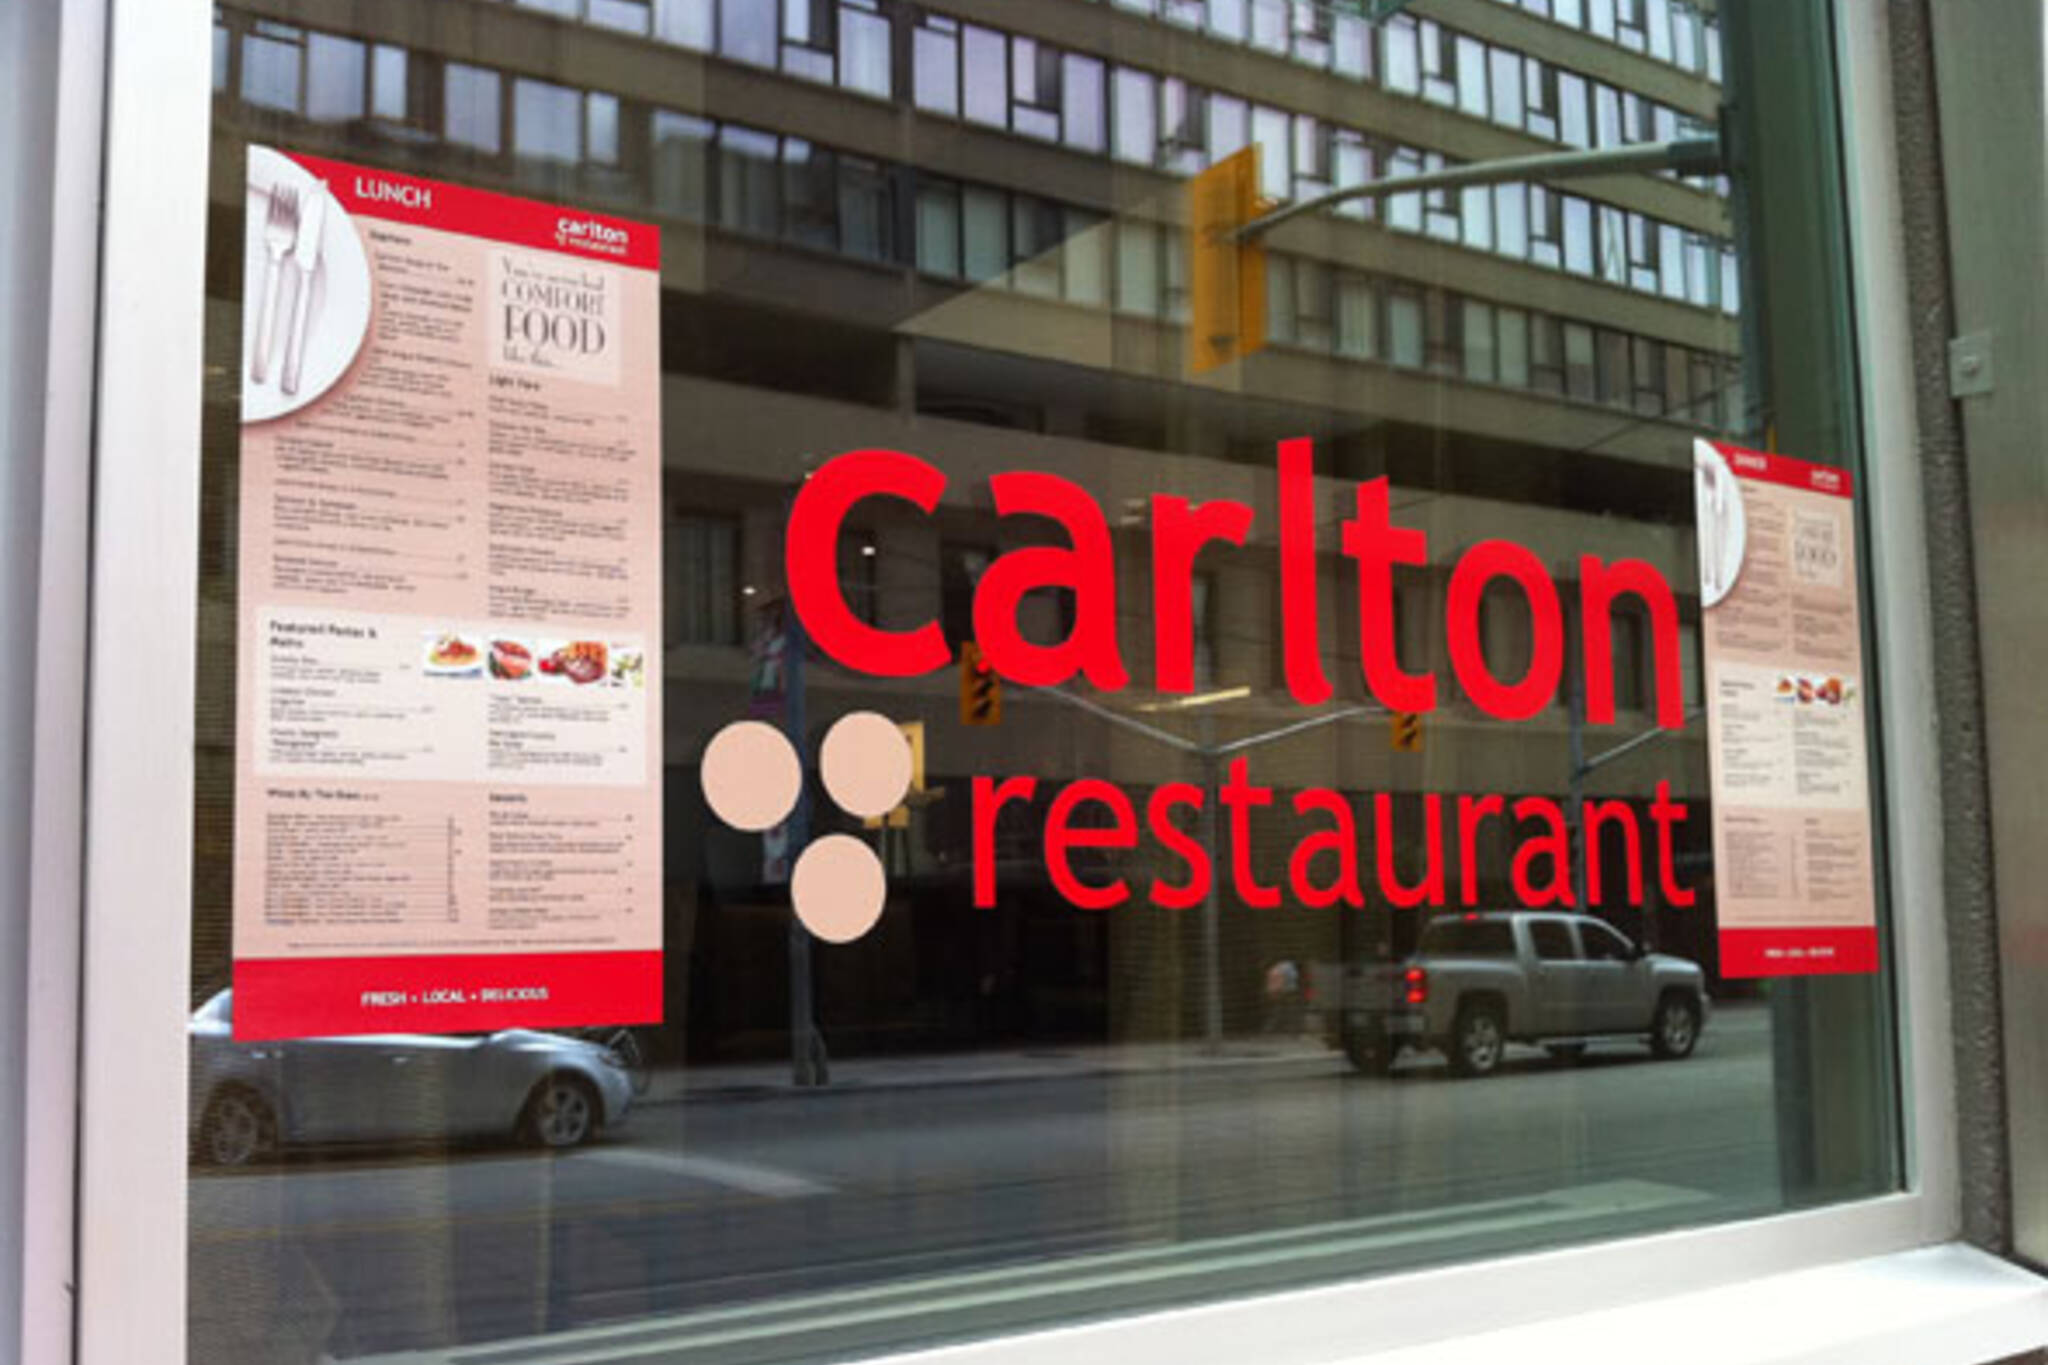 Carlton Restaurant Toronto